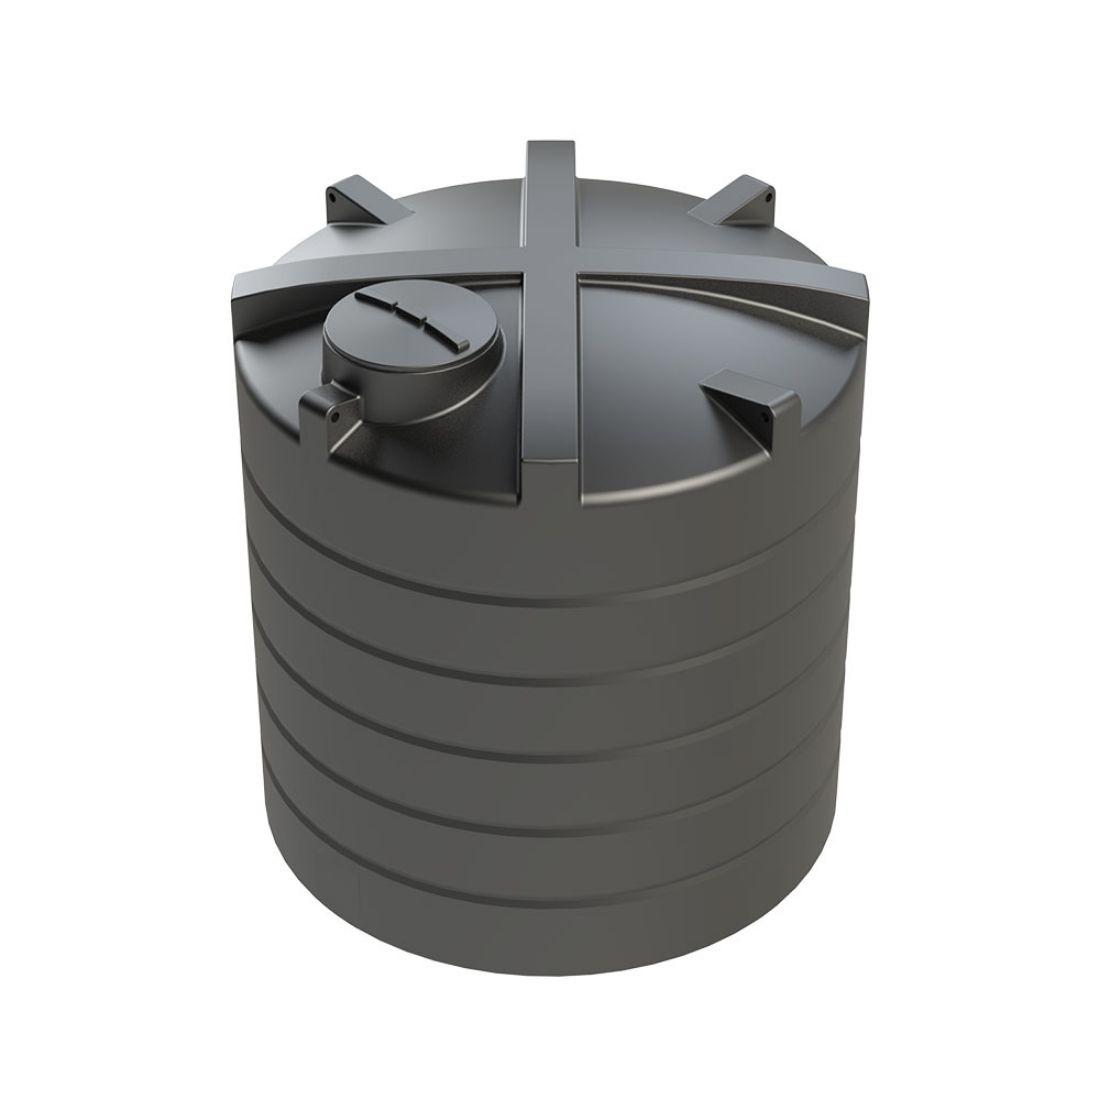 Enduramaxx 10,000 Litre Vertical Potable WRAS Water Storage Tank